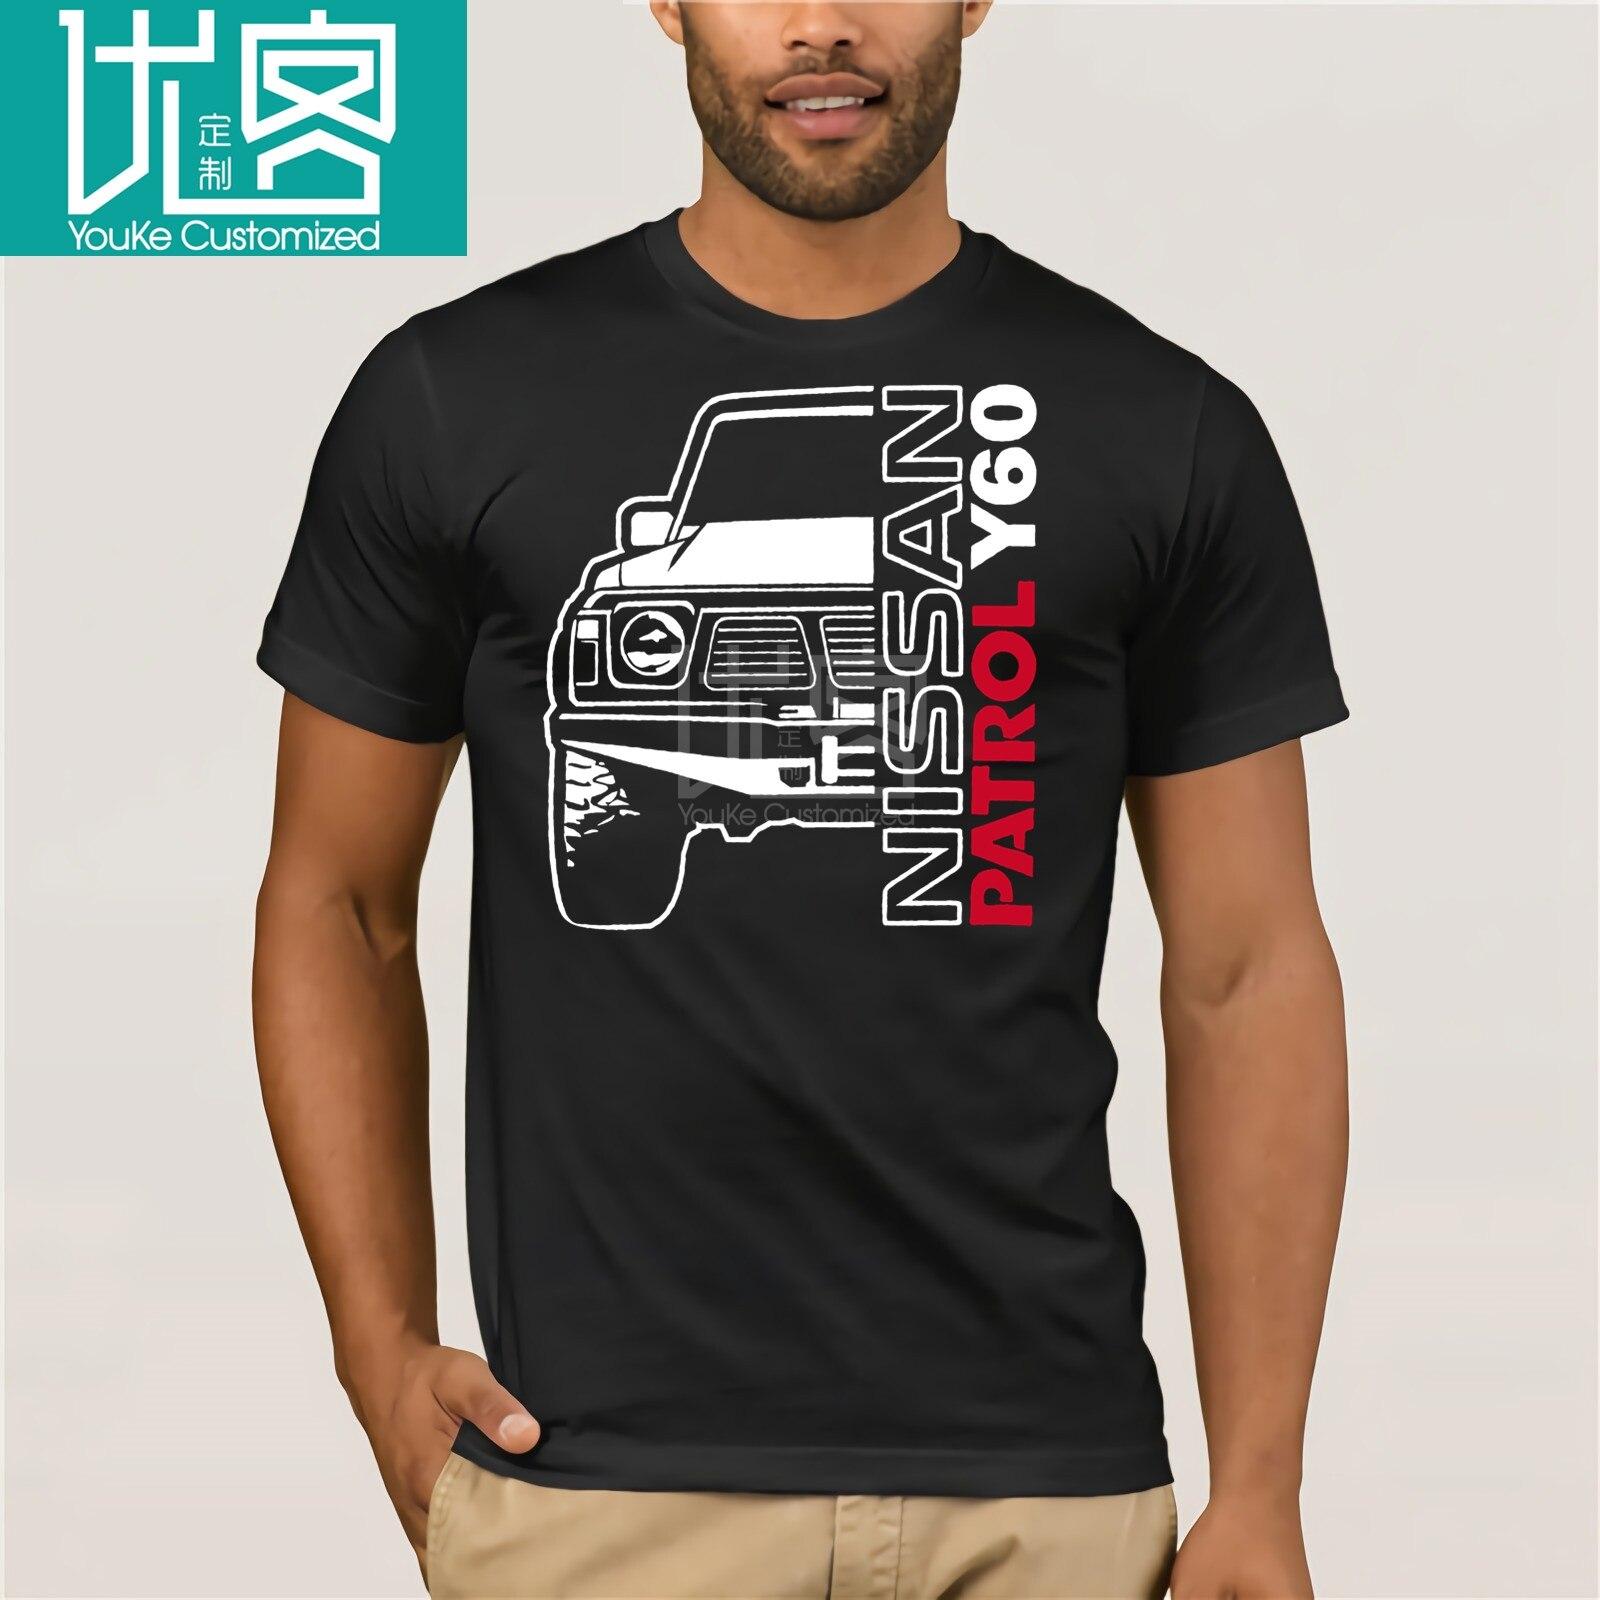 Nissan Patrol Y60 T-shirt Men's New Fashion O-neck Cotton Short Sleeves Tops Tee Printed Unisex Casual T-shirt